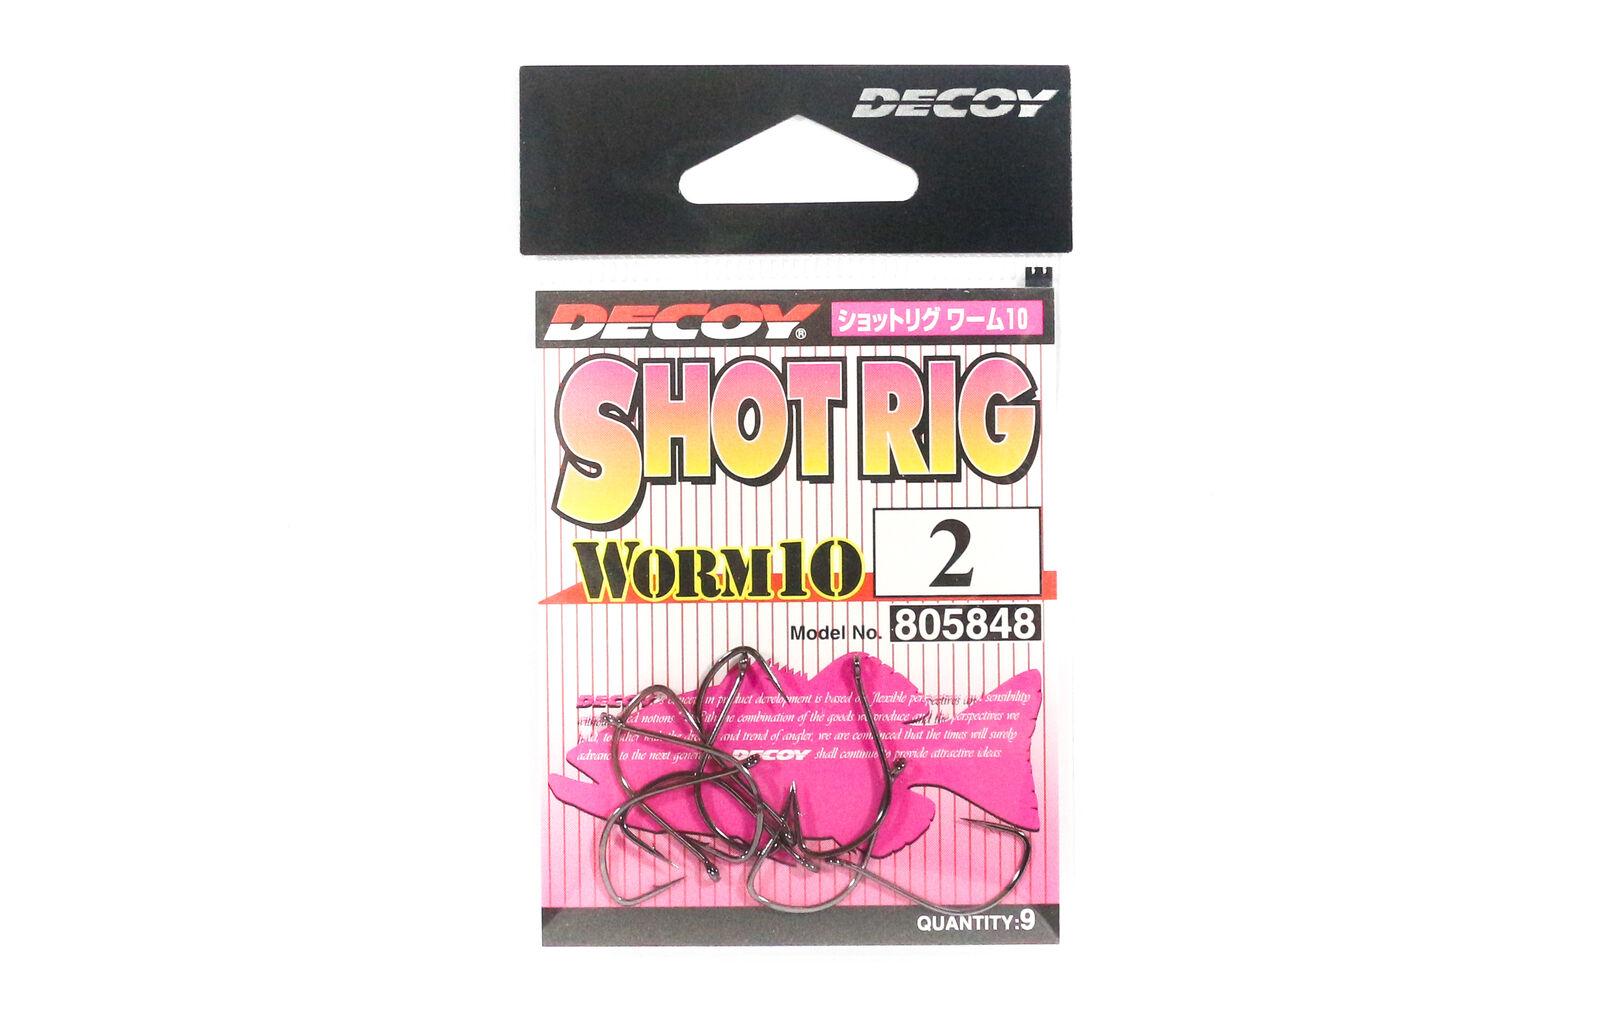 Decoy MG-1 Mini Worm Hook Rock Fish Game Size 6 1764